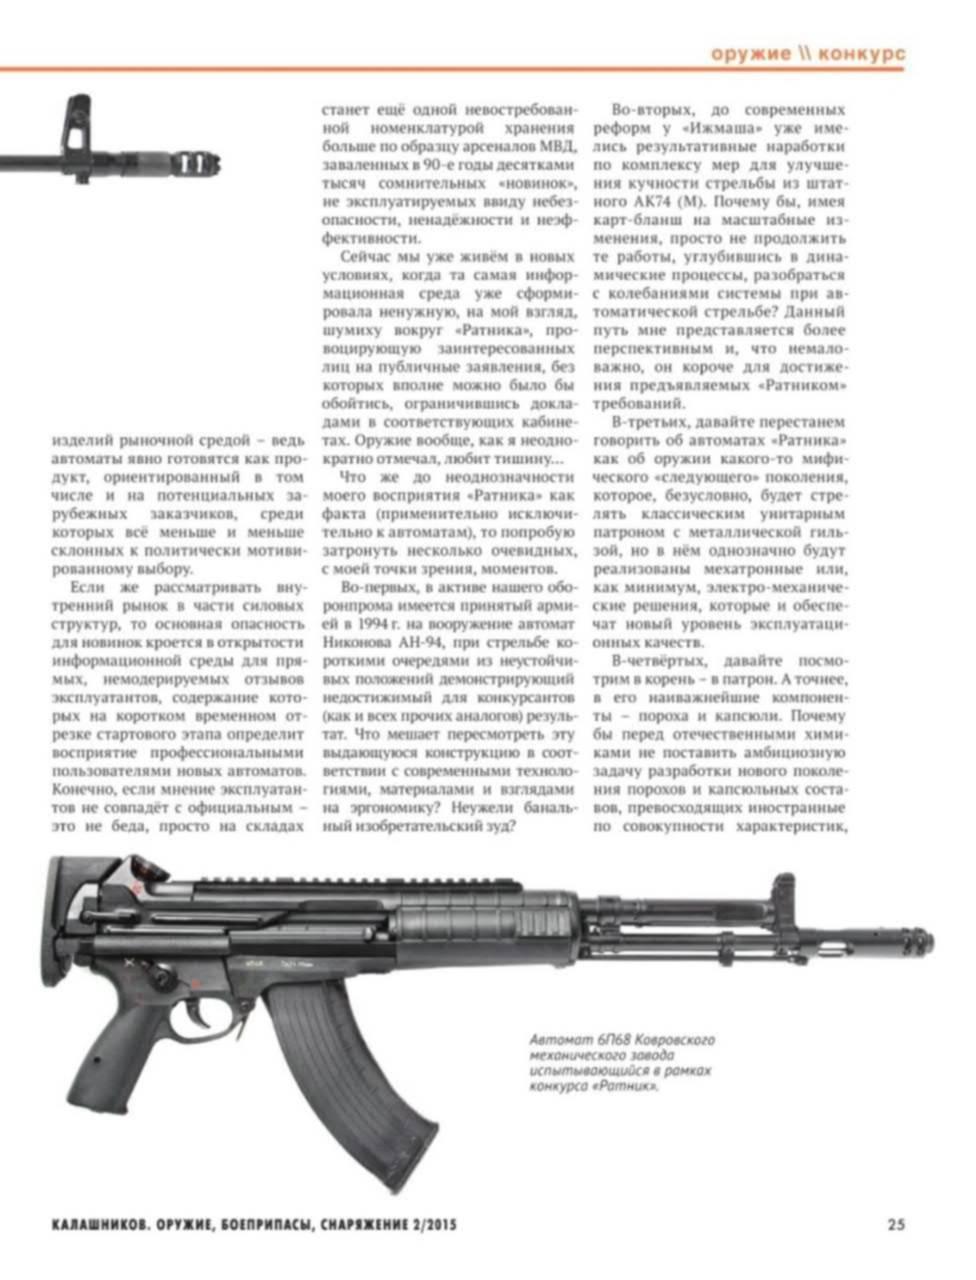 Ан-94 википедия